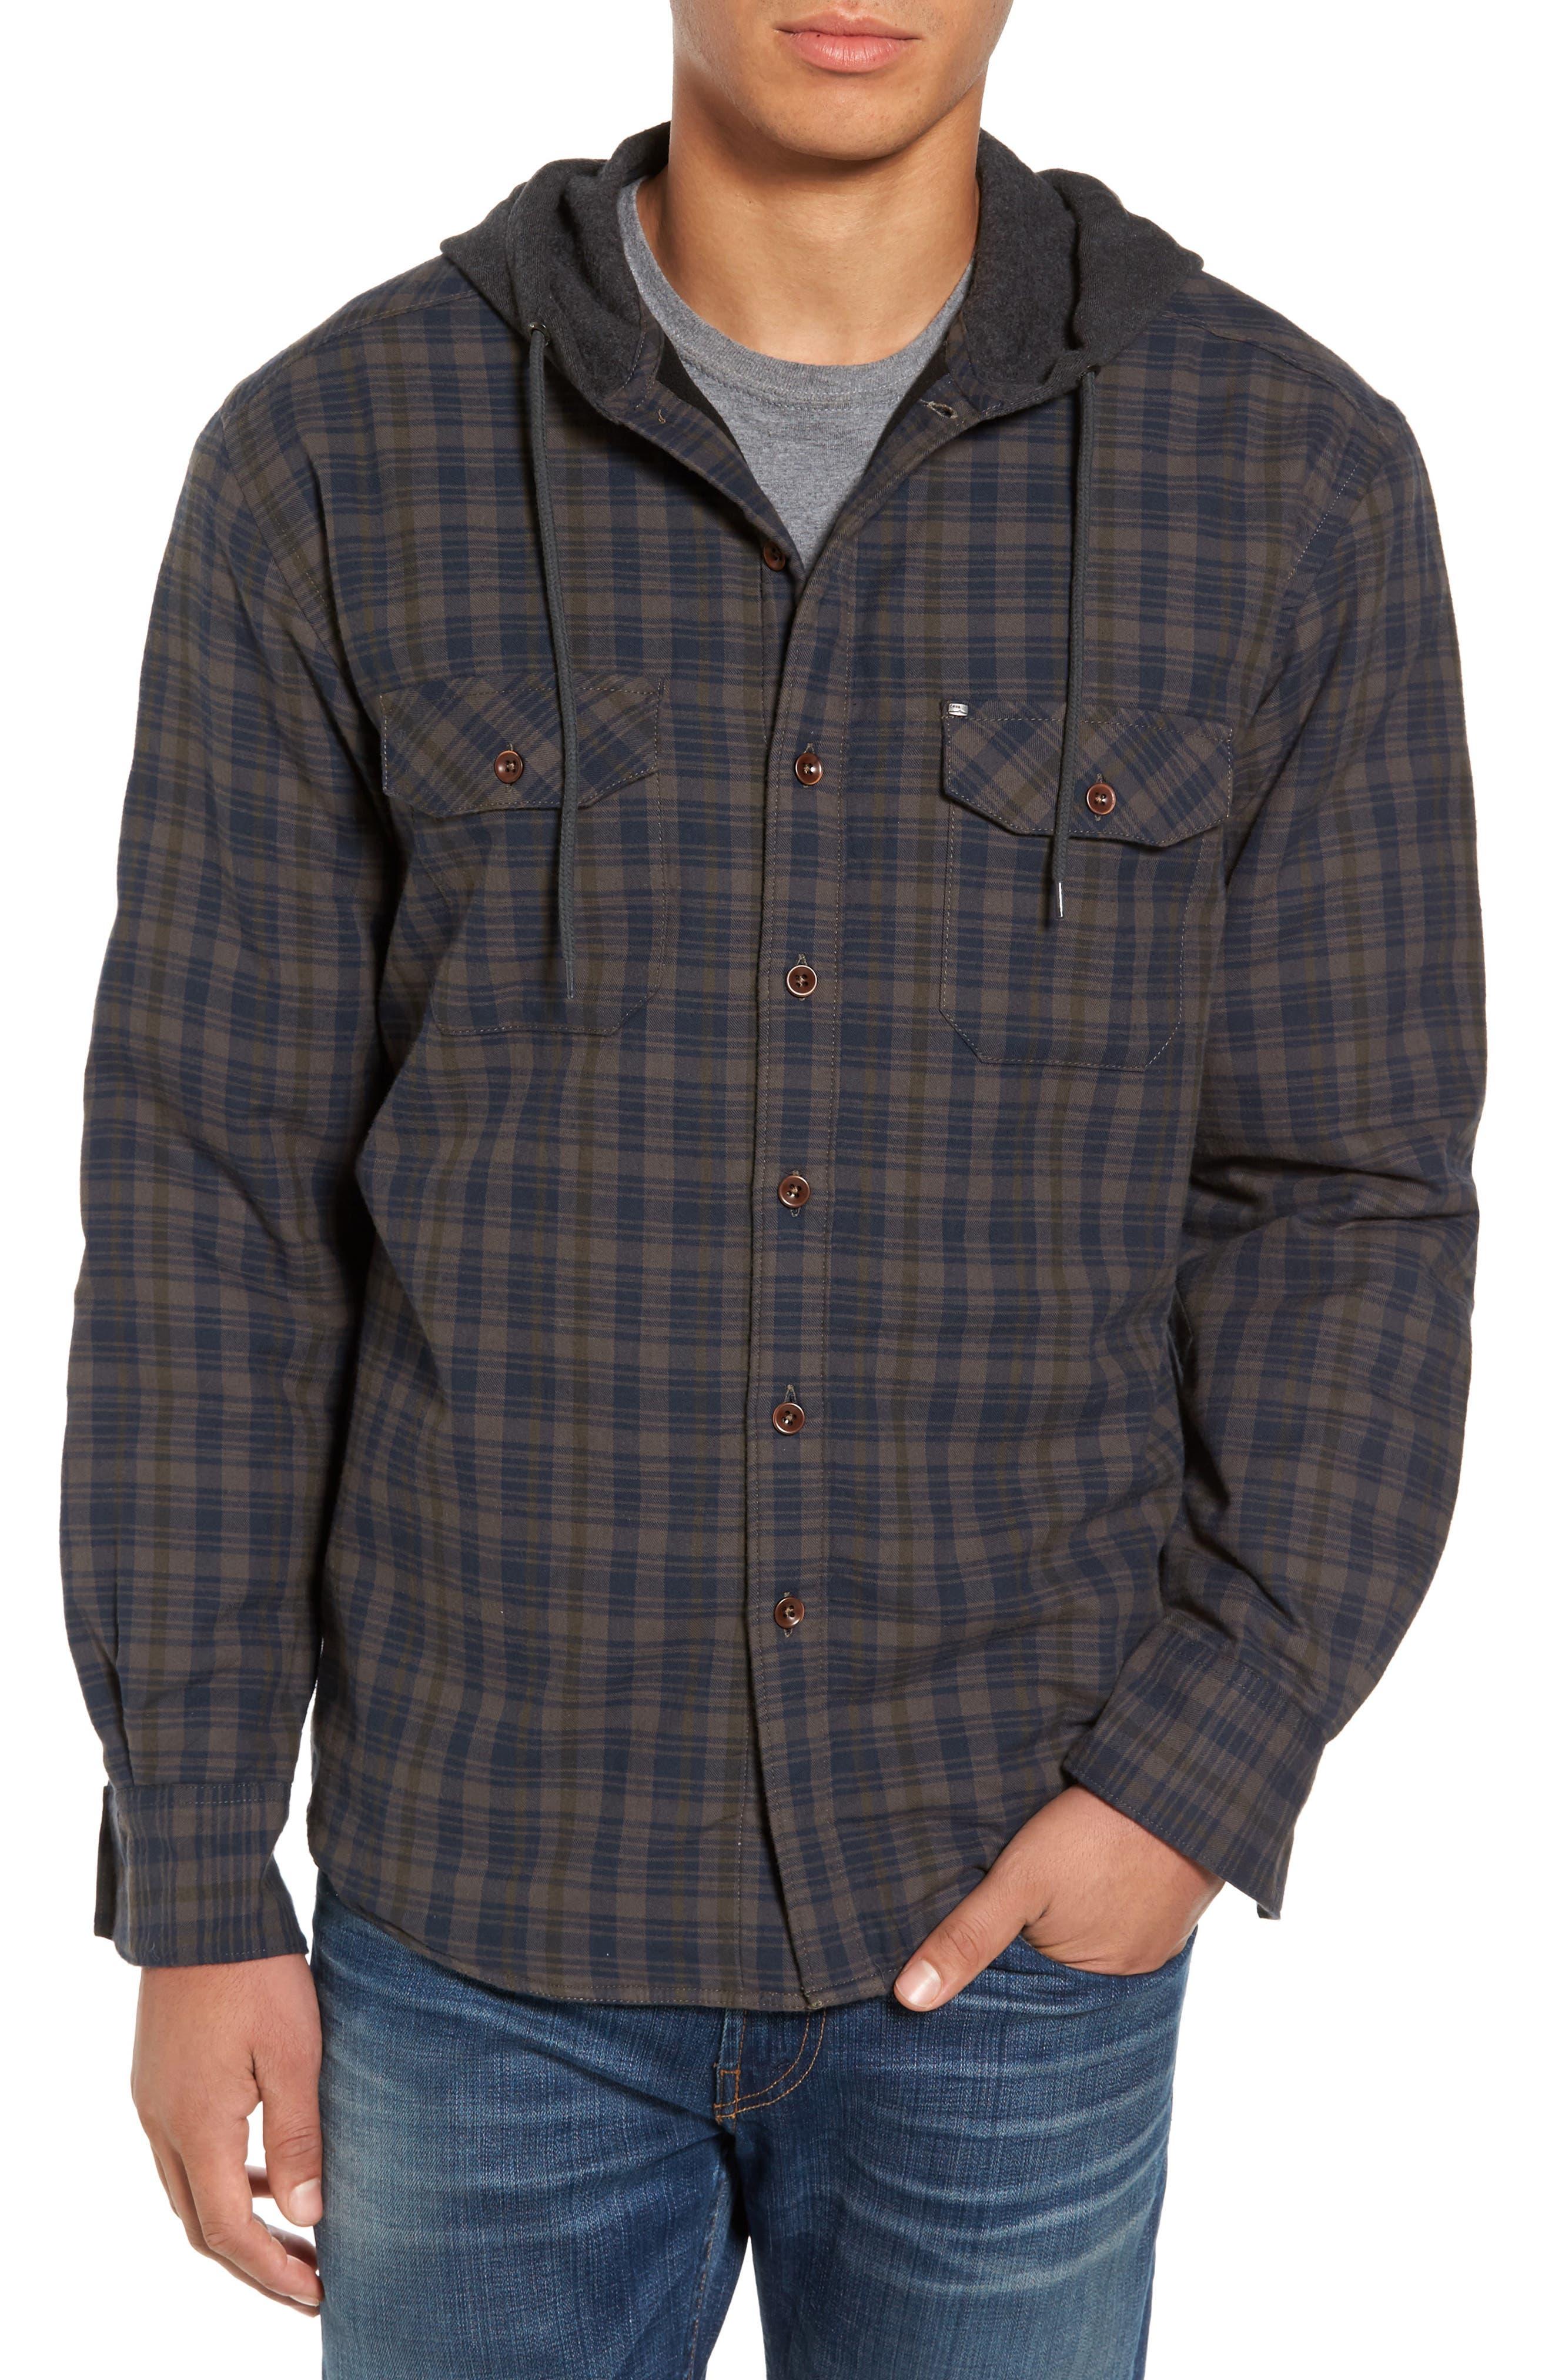 Cova Hooded Plaid Flannel Shirt Jacket